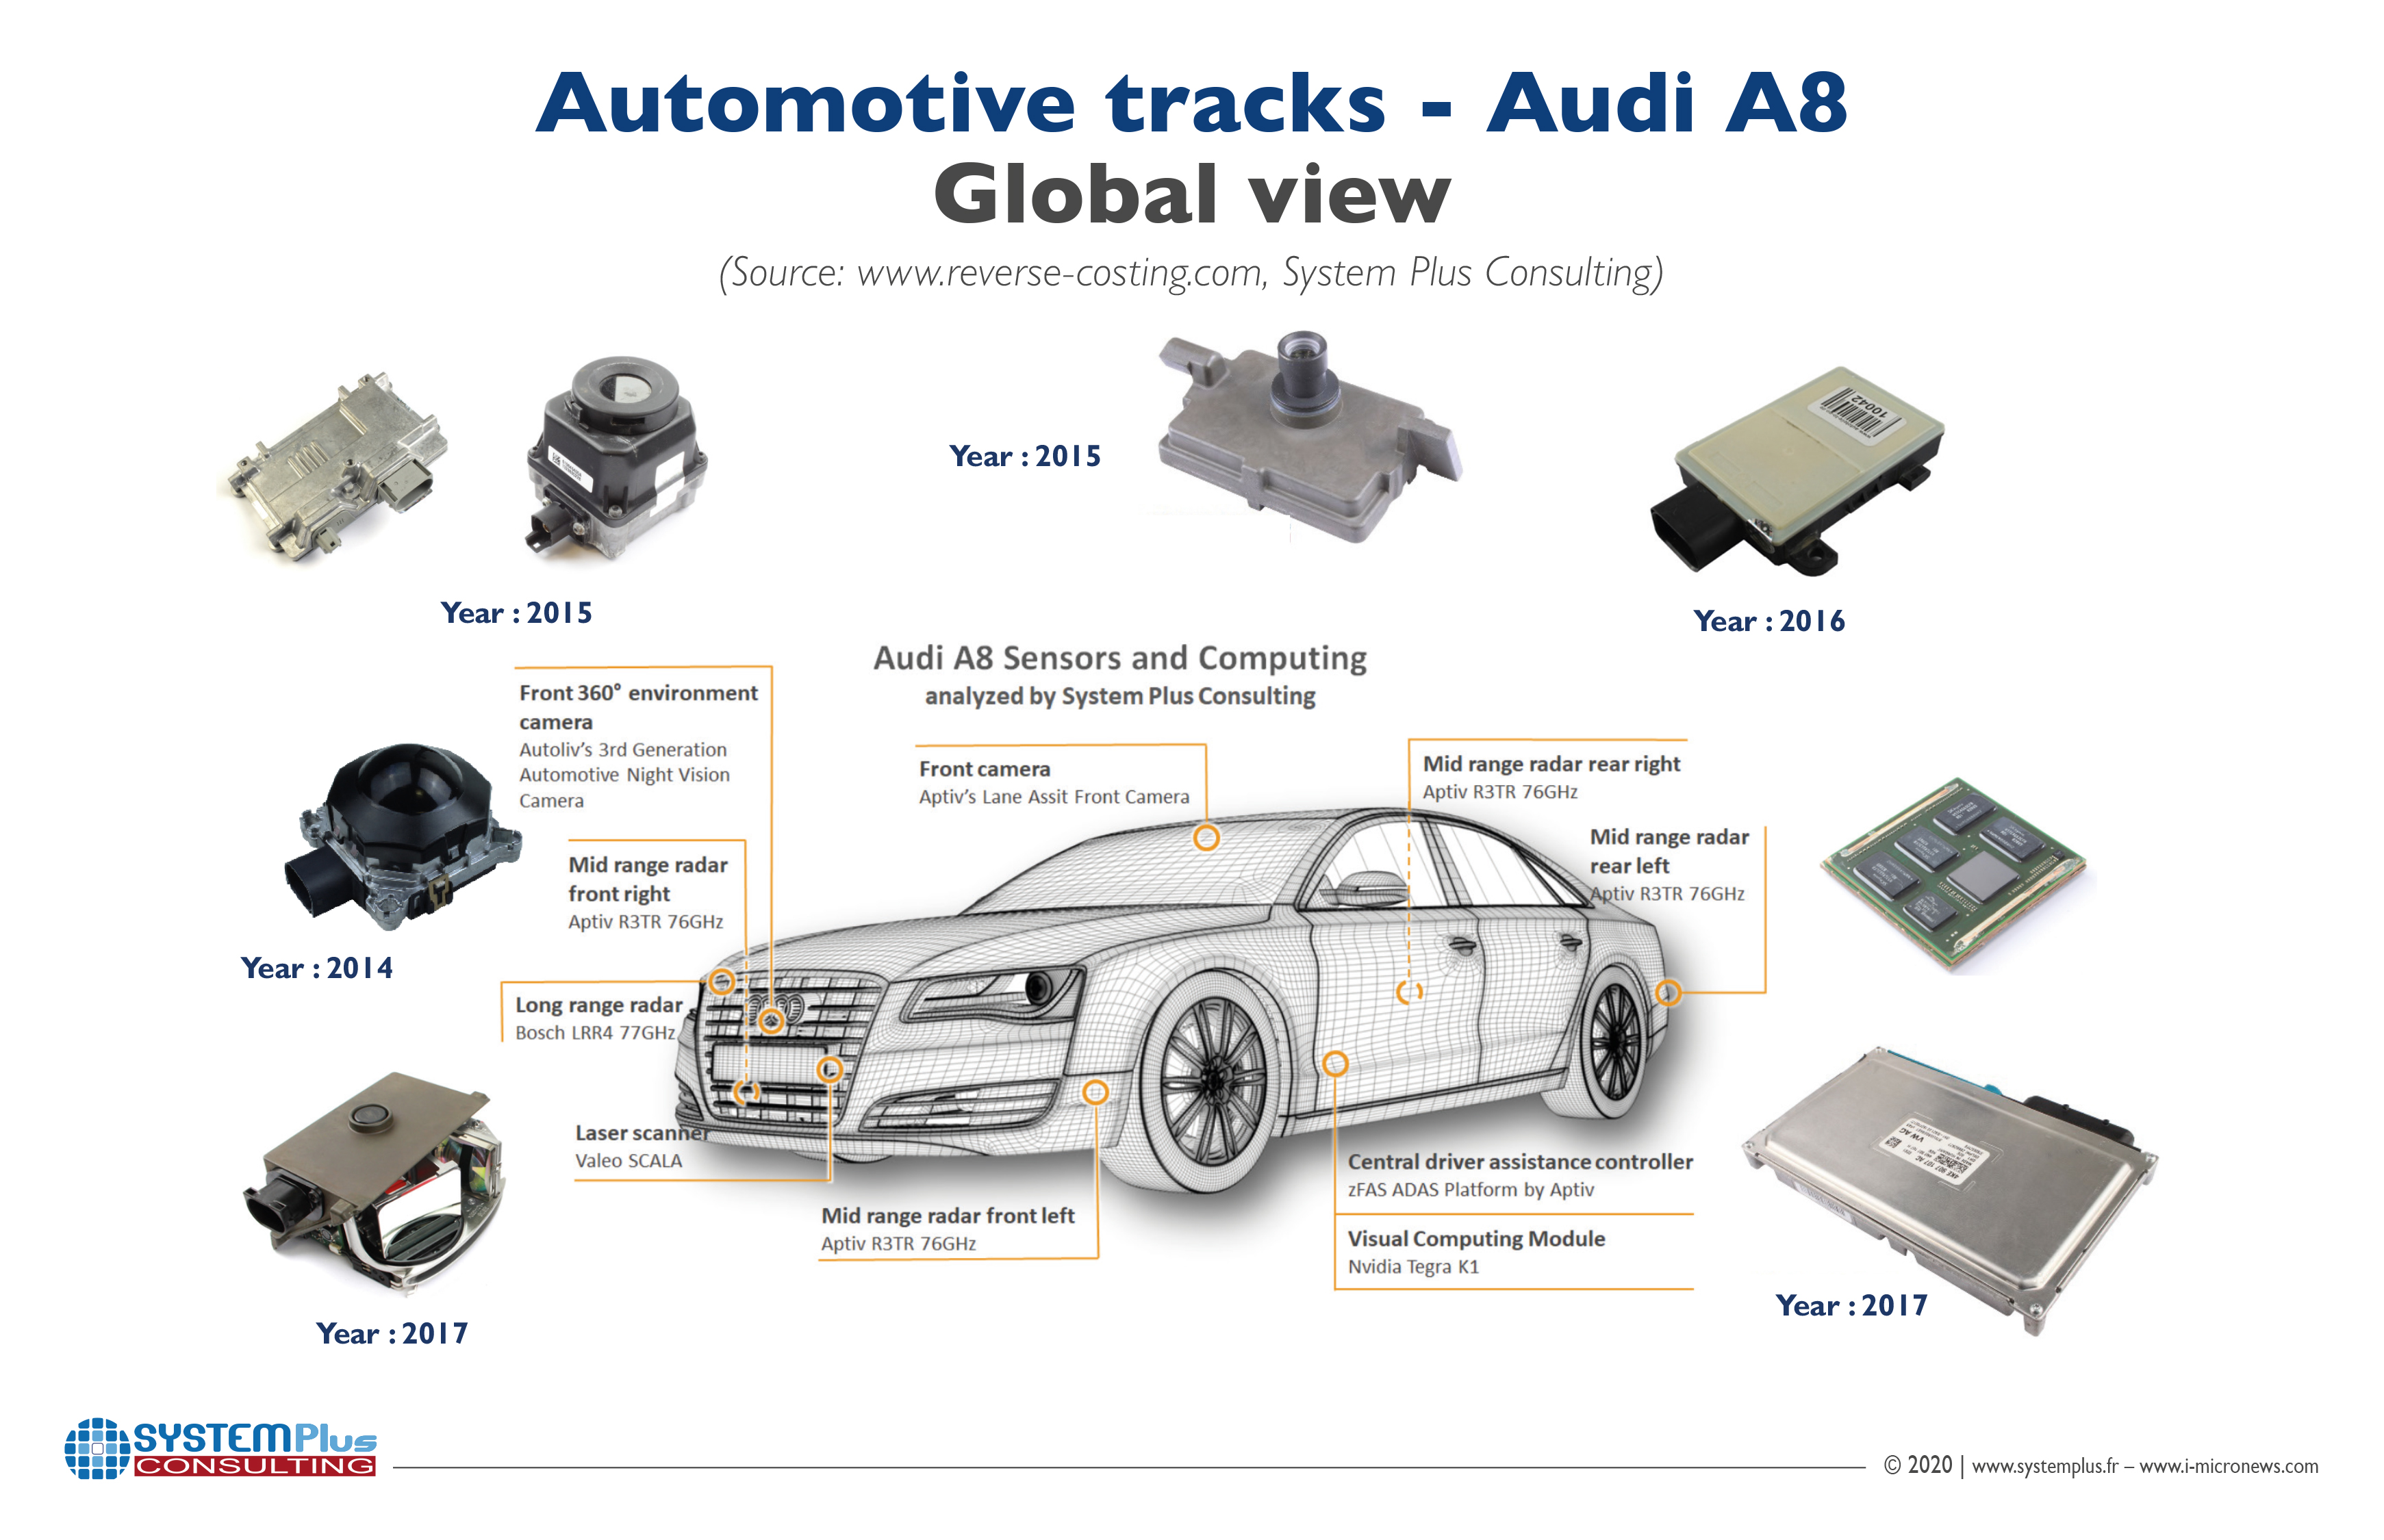 ILLUS_AUTOMOTIVE_TRACKS_AudiA8_GlobalView_SYSTEMPLUSCONSULTING_April2020